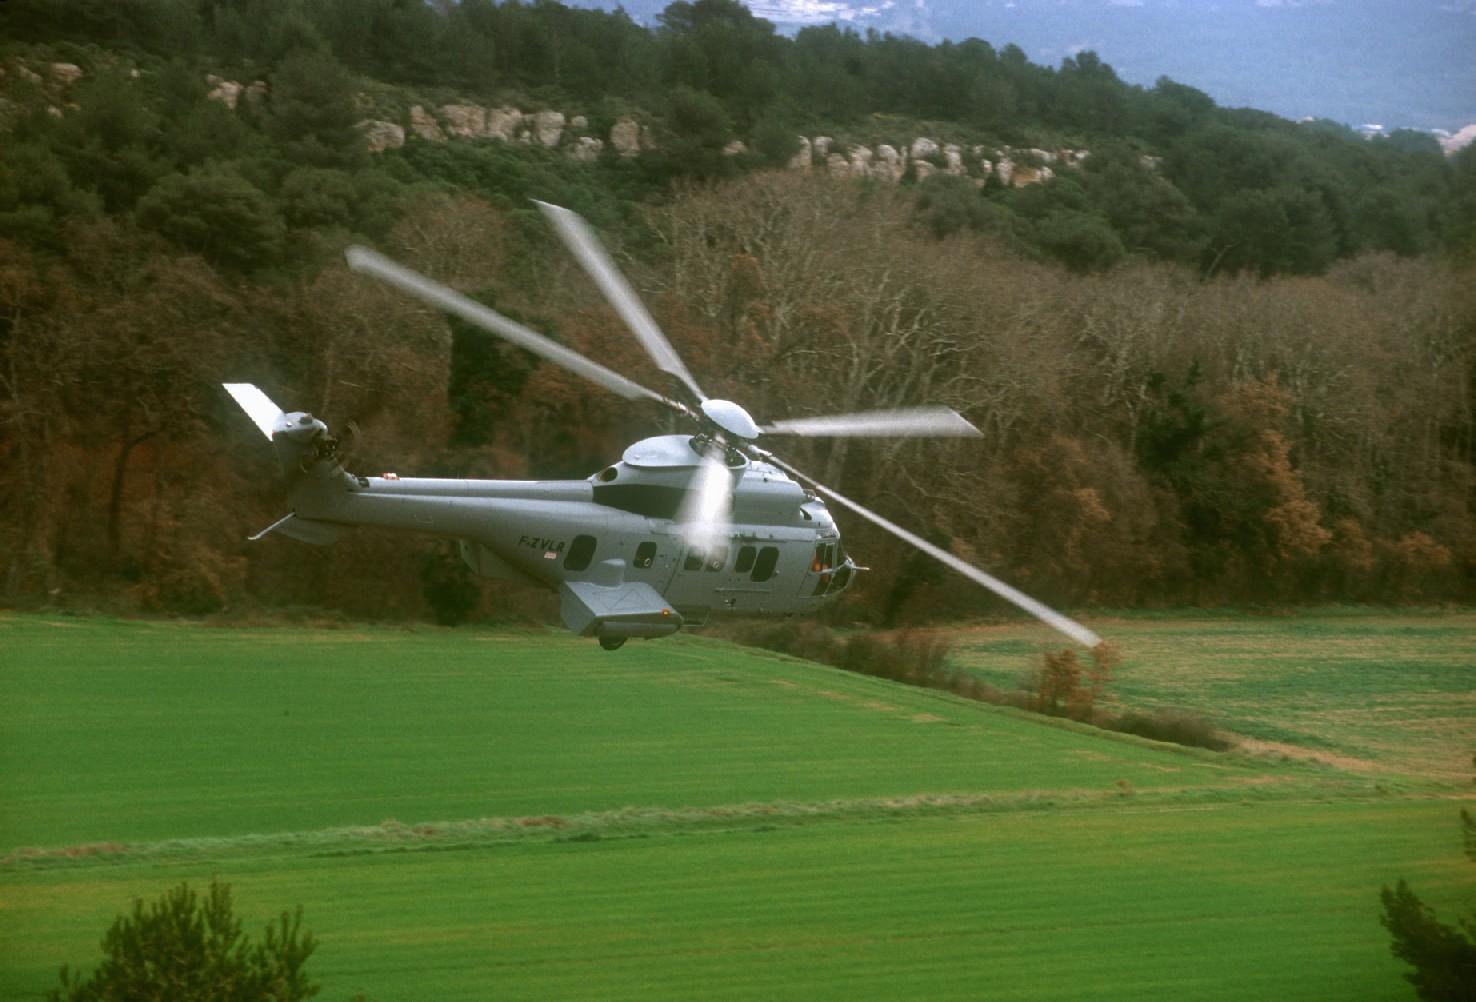 ec725-foto-2-eurocopter